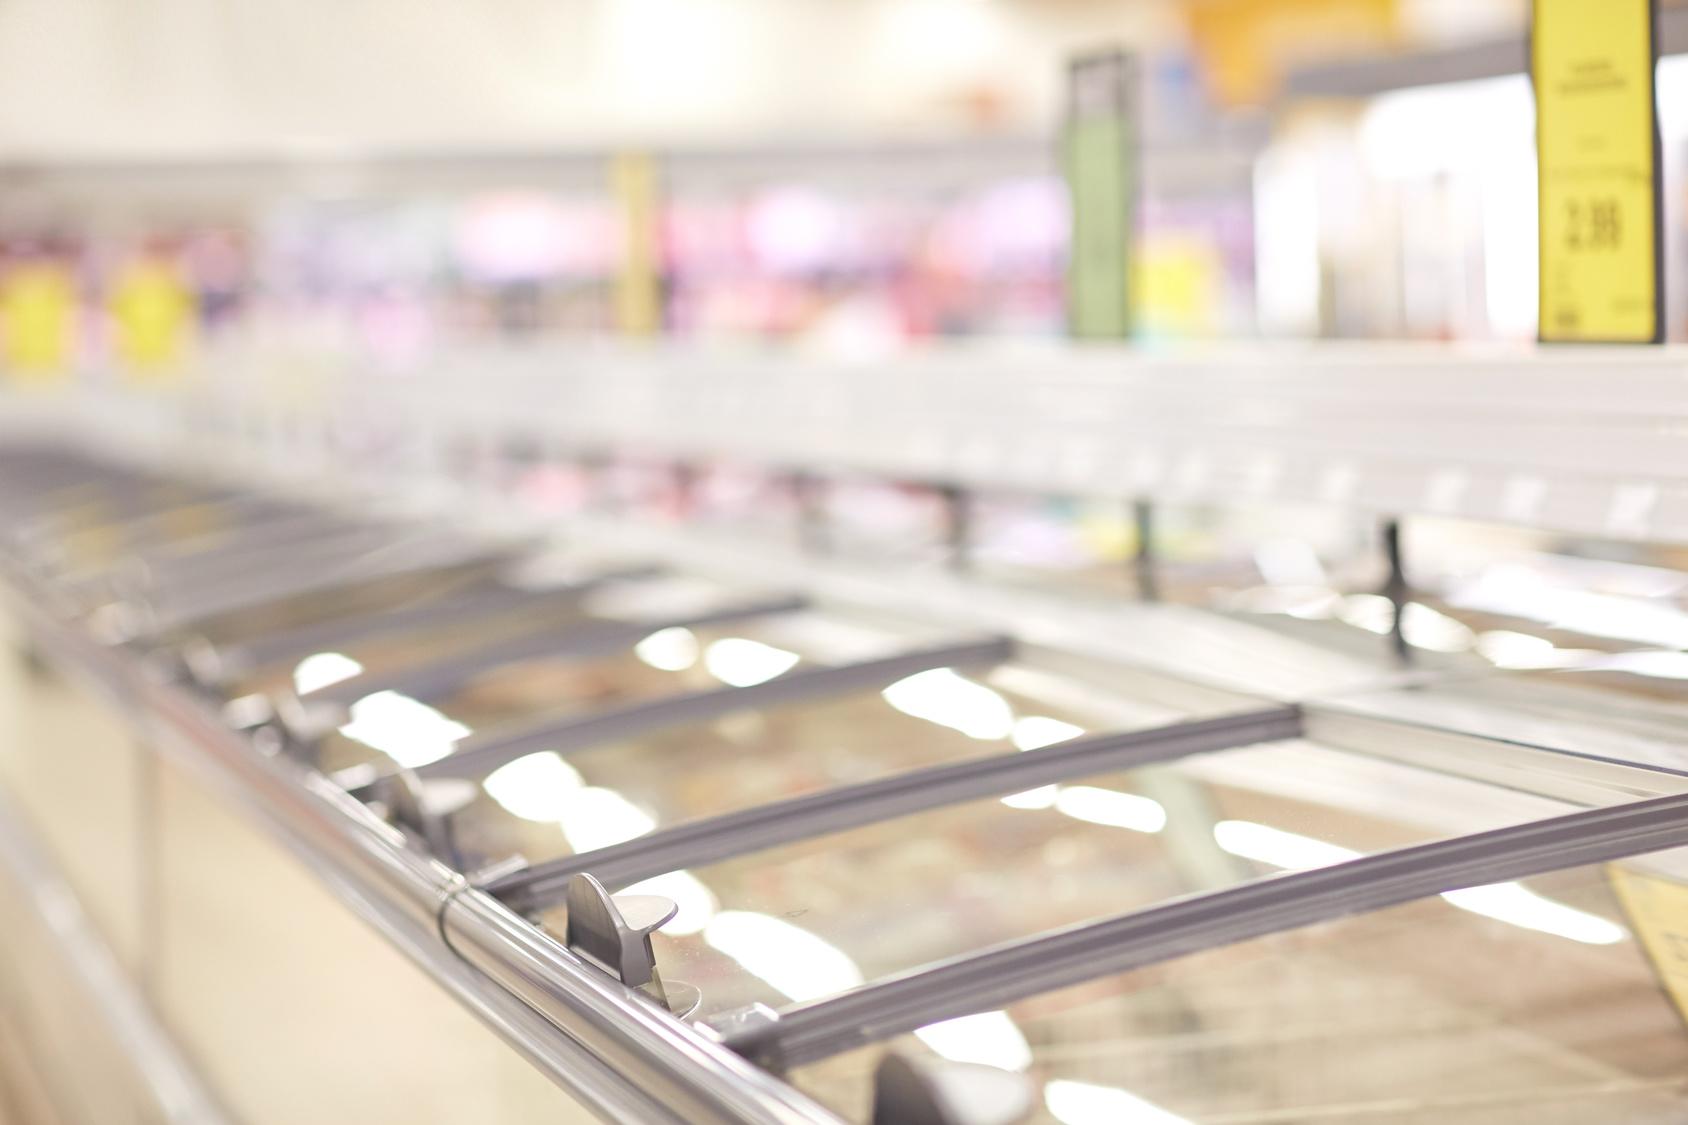 banco frigo per supermercato salerno